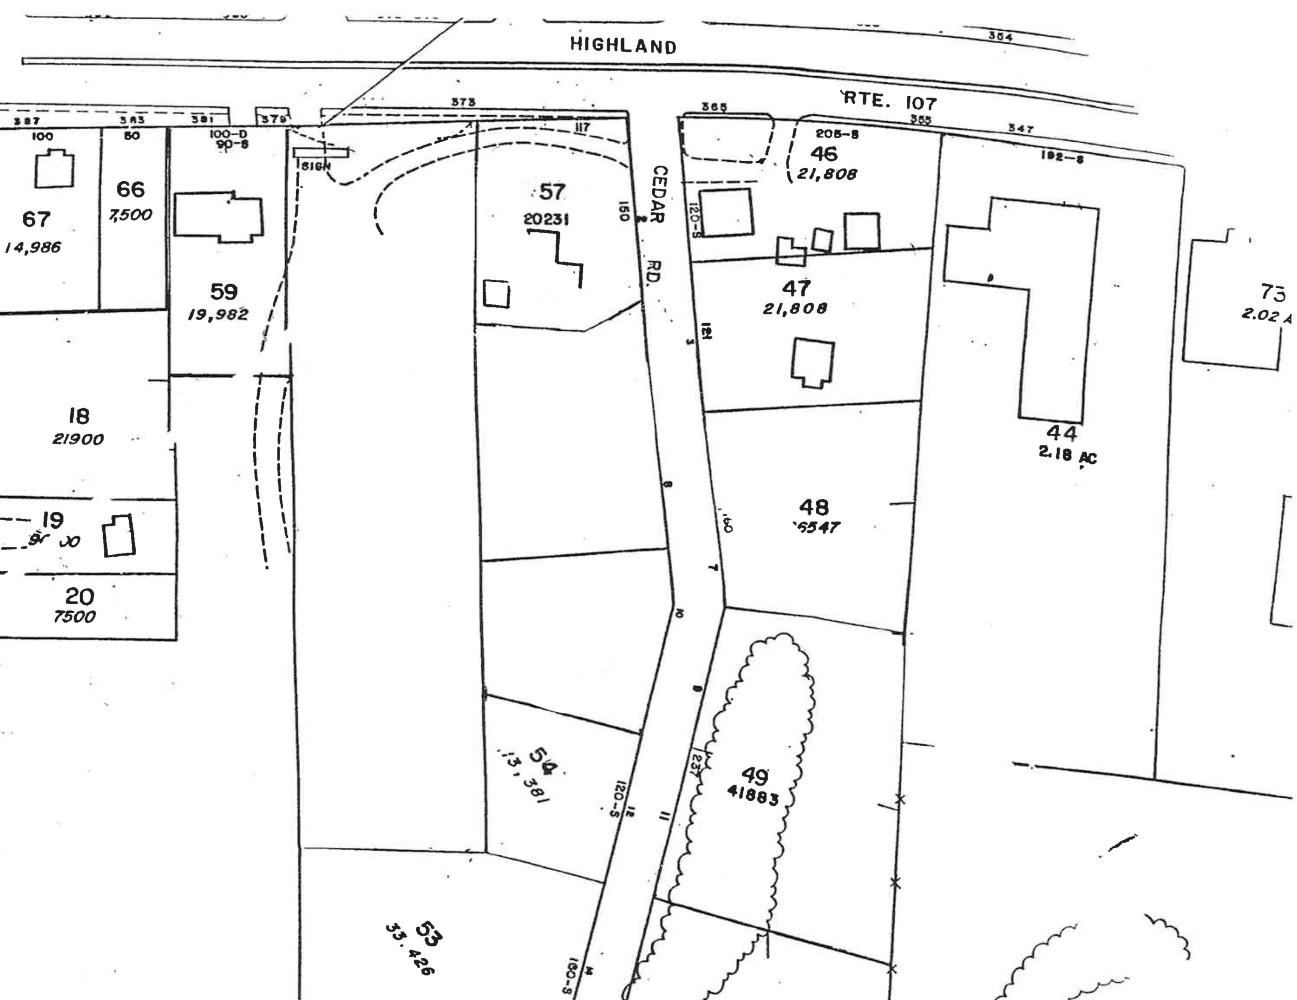 Salem, MA - 5 Acres Developable Land